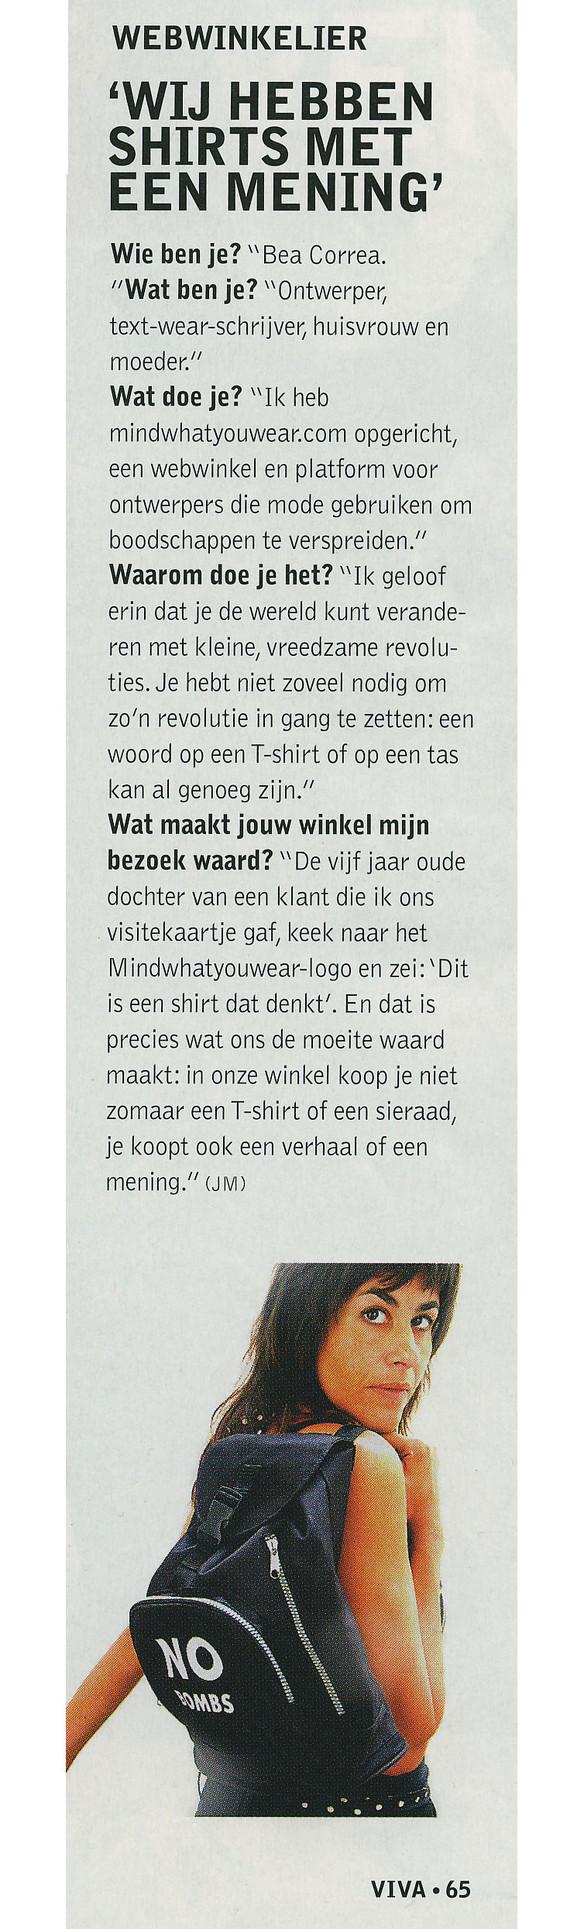 Viva magazine, The Netherlands